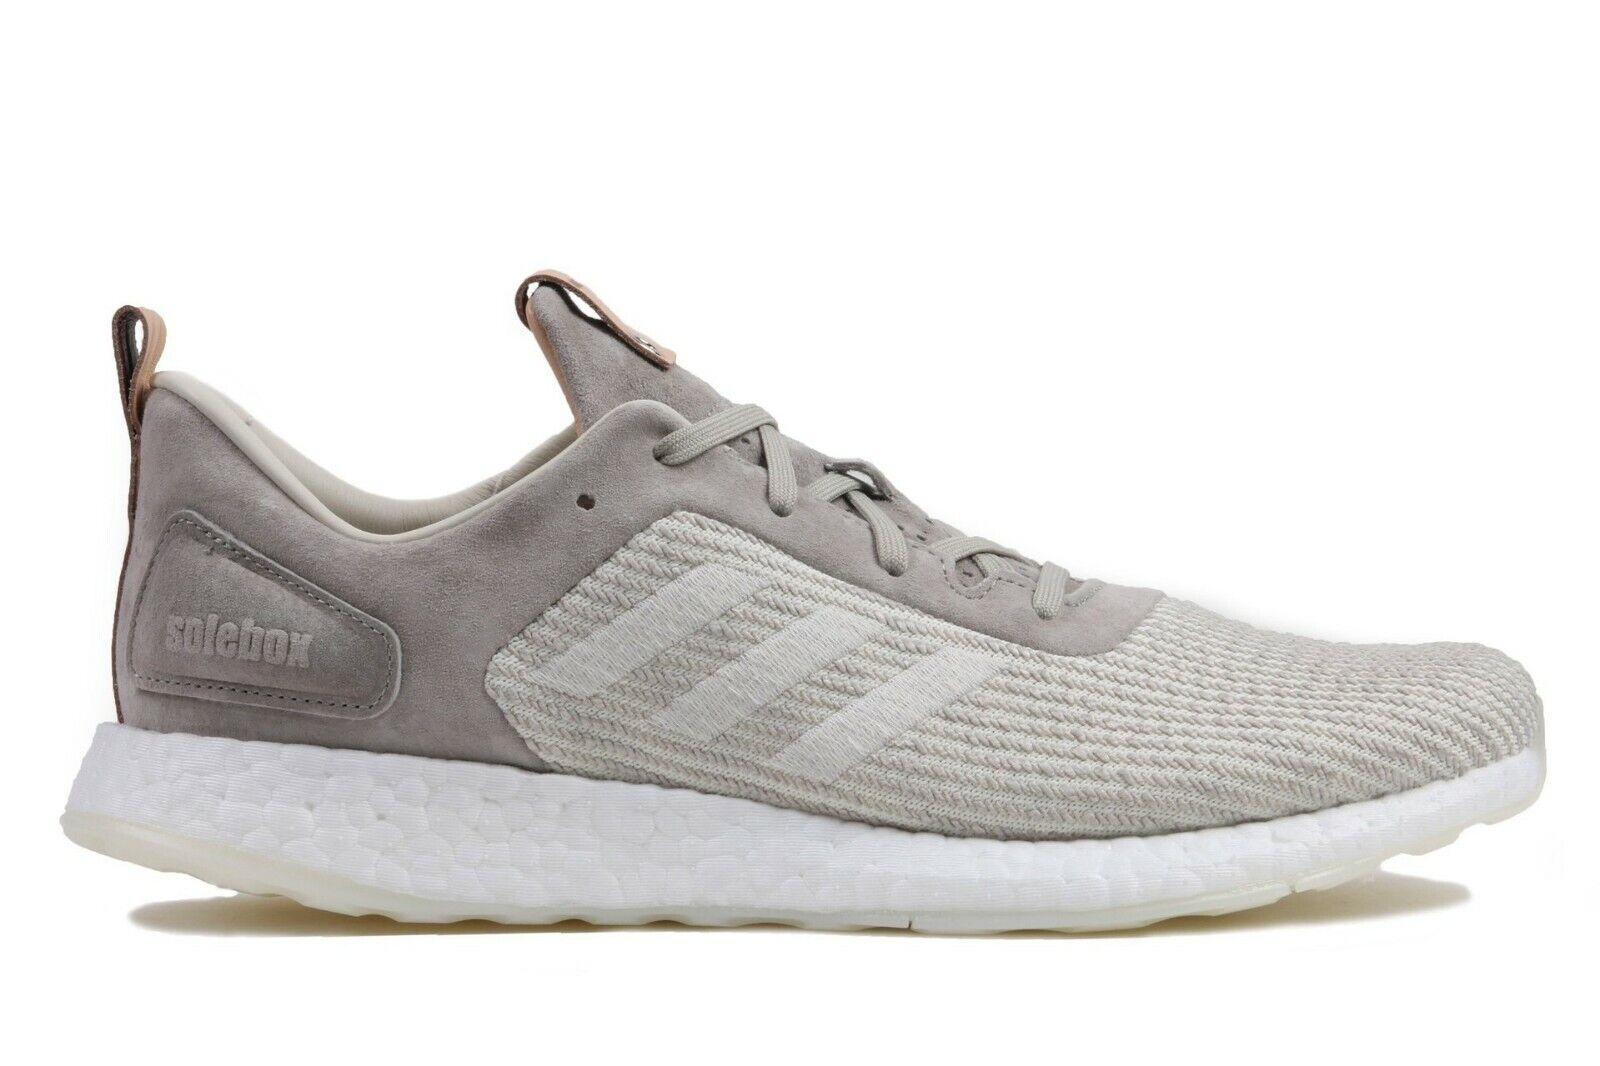 Nuevo Adidas Pureboost DPR Solebox 8-9 B27992 Zapato Ultraboost Ultra Boost pura NMD